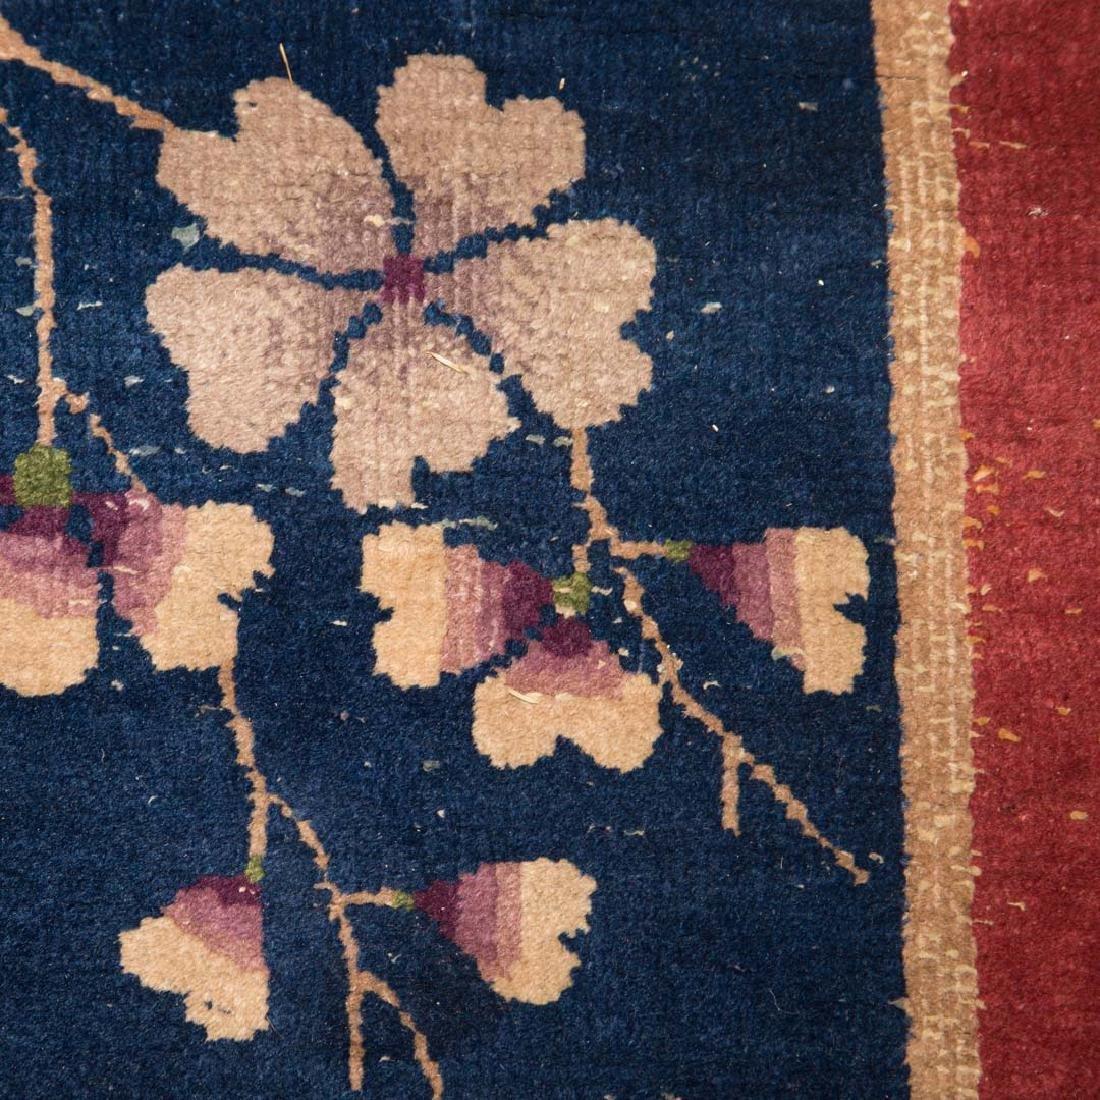 Antique Nichols Chinese carpet, approx. 8.9 x 11.6 - 3